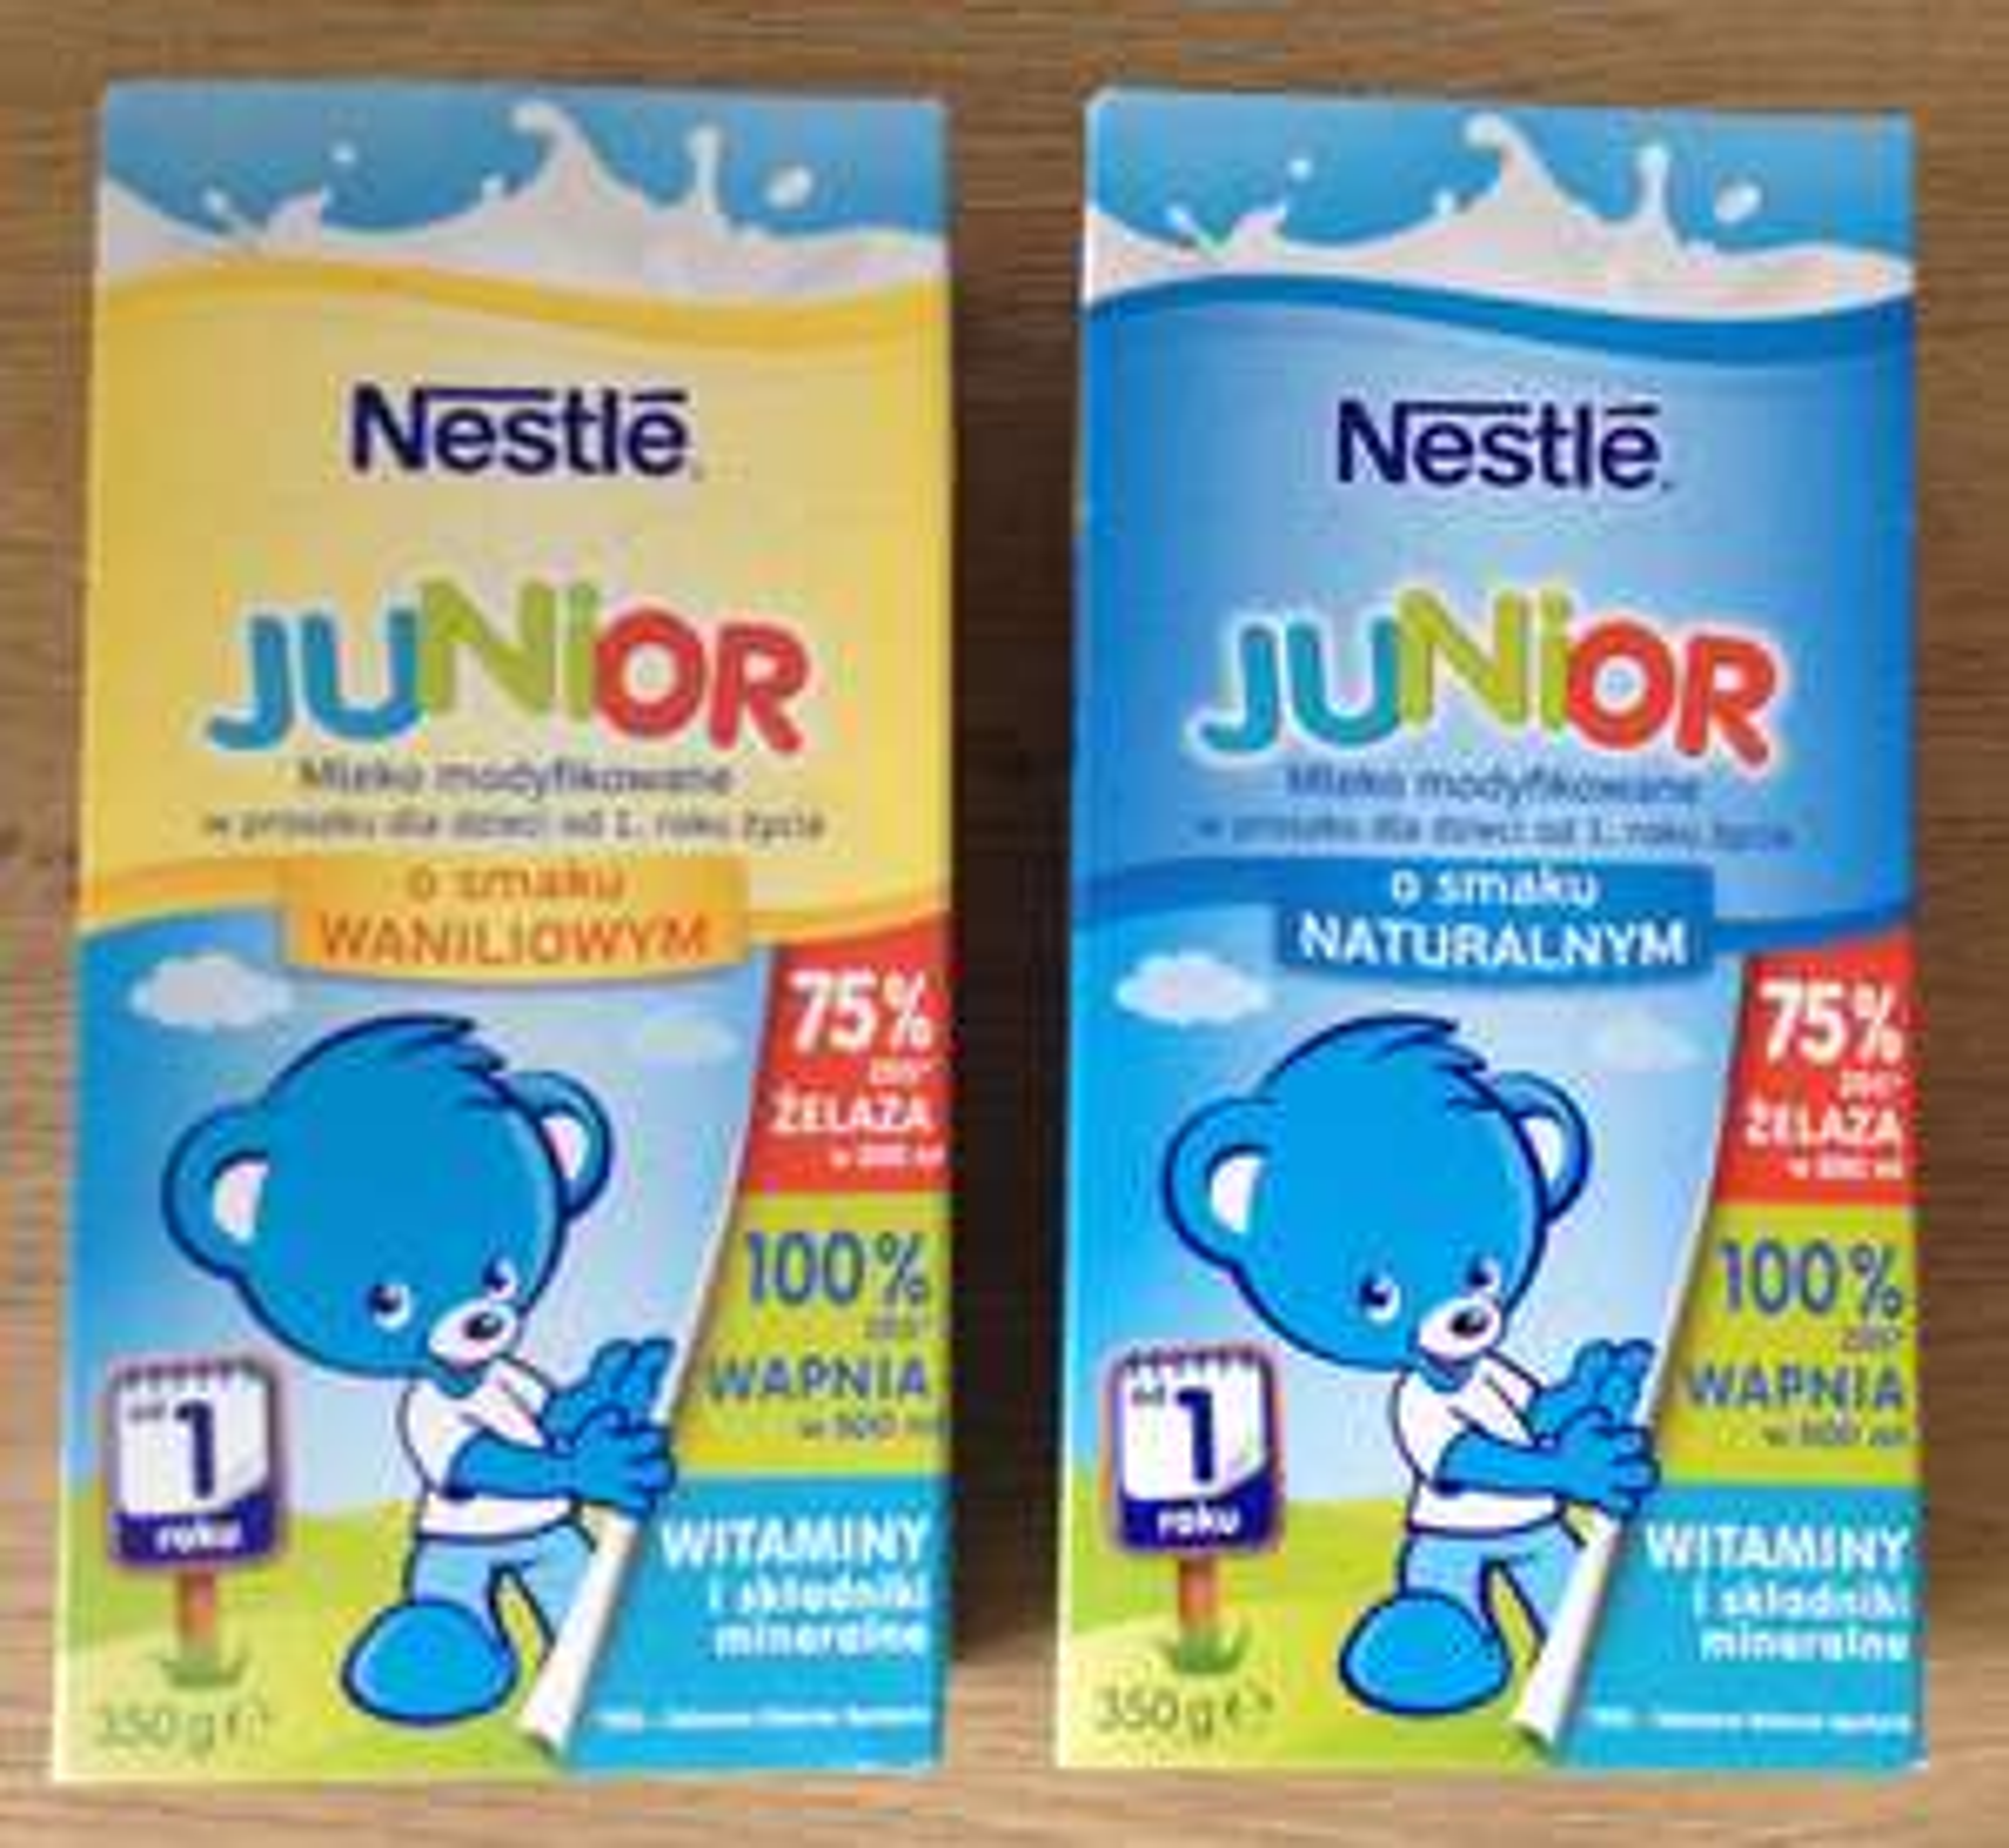 Mleko modyfikowane Nestle Junior, 350g @ Rossmann